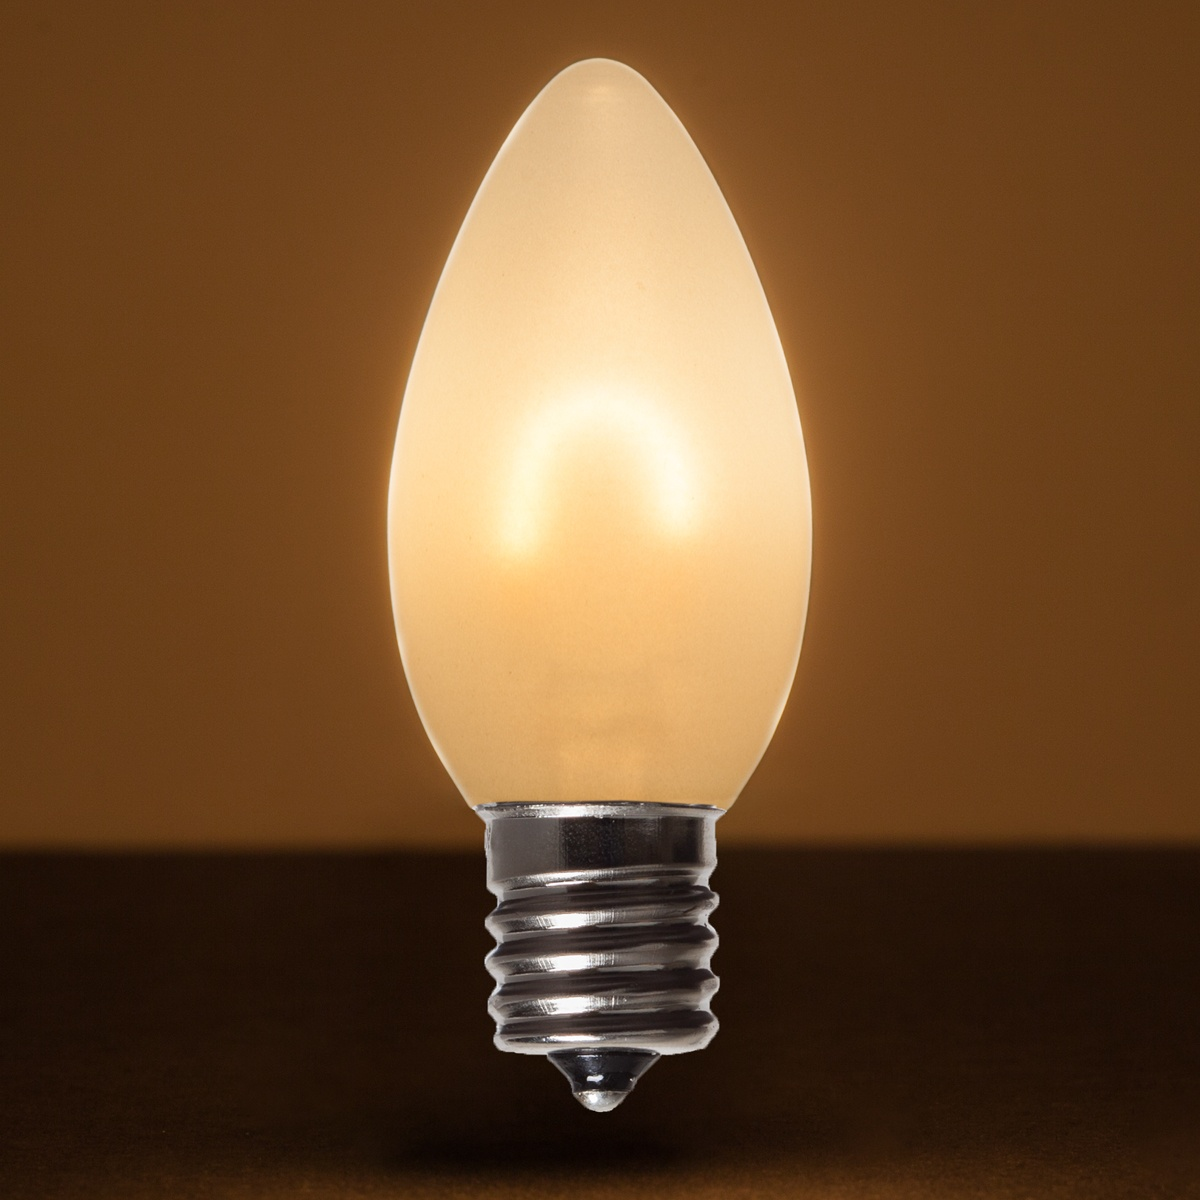 Led Bulbd: C9 FlexFilament TM Vintage LED Light Bulb, Warm White